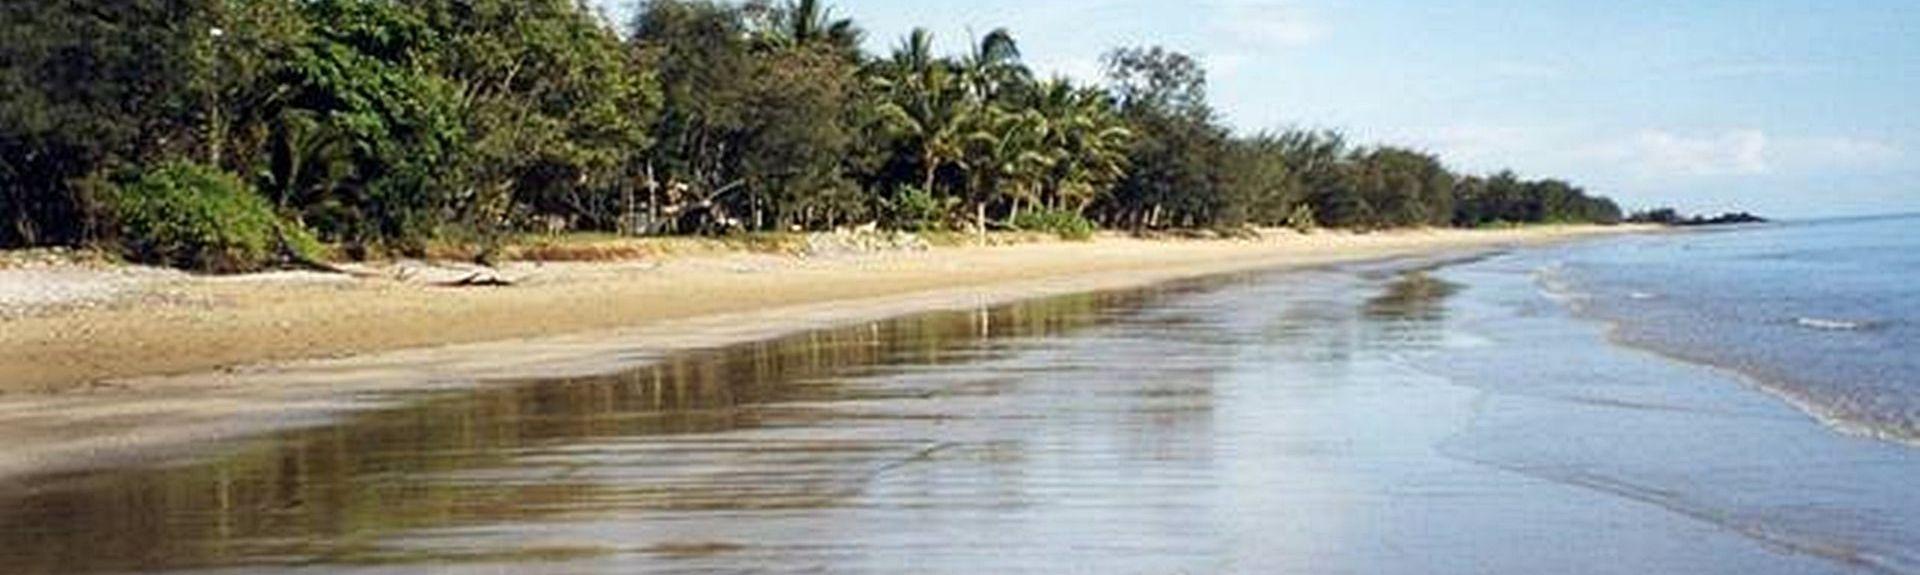 Four Mile Beach Park, Port Douglas, Queensland, Australia